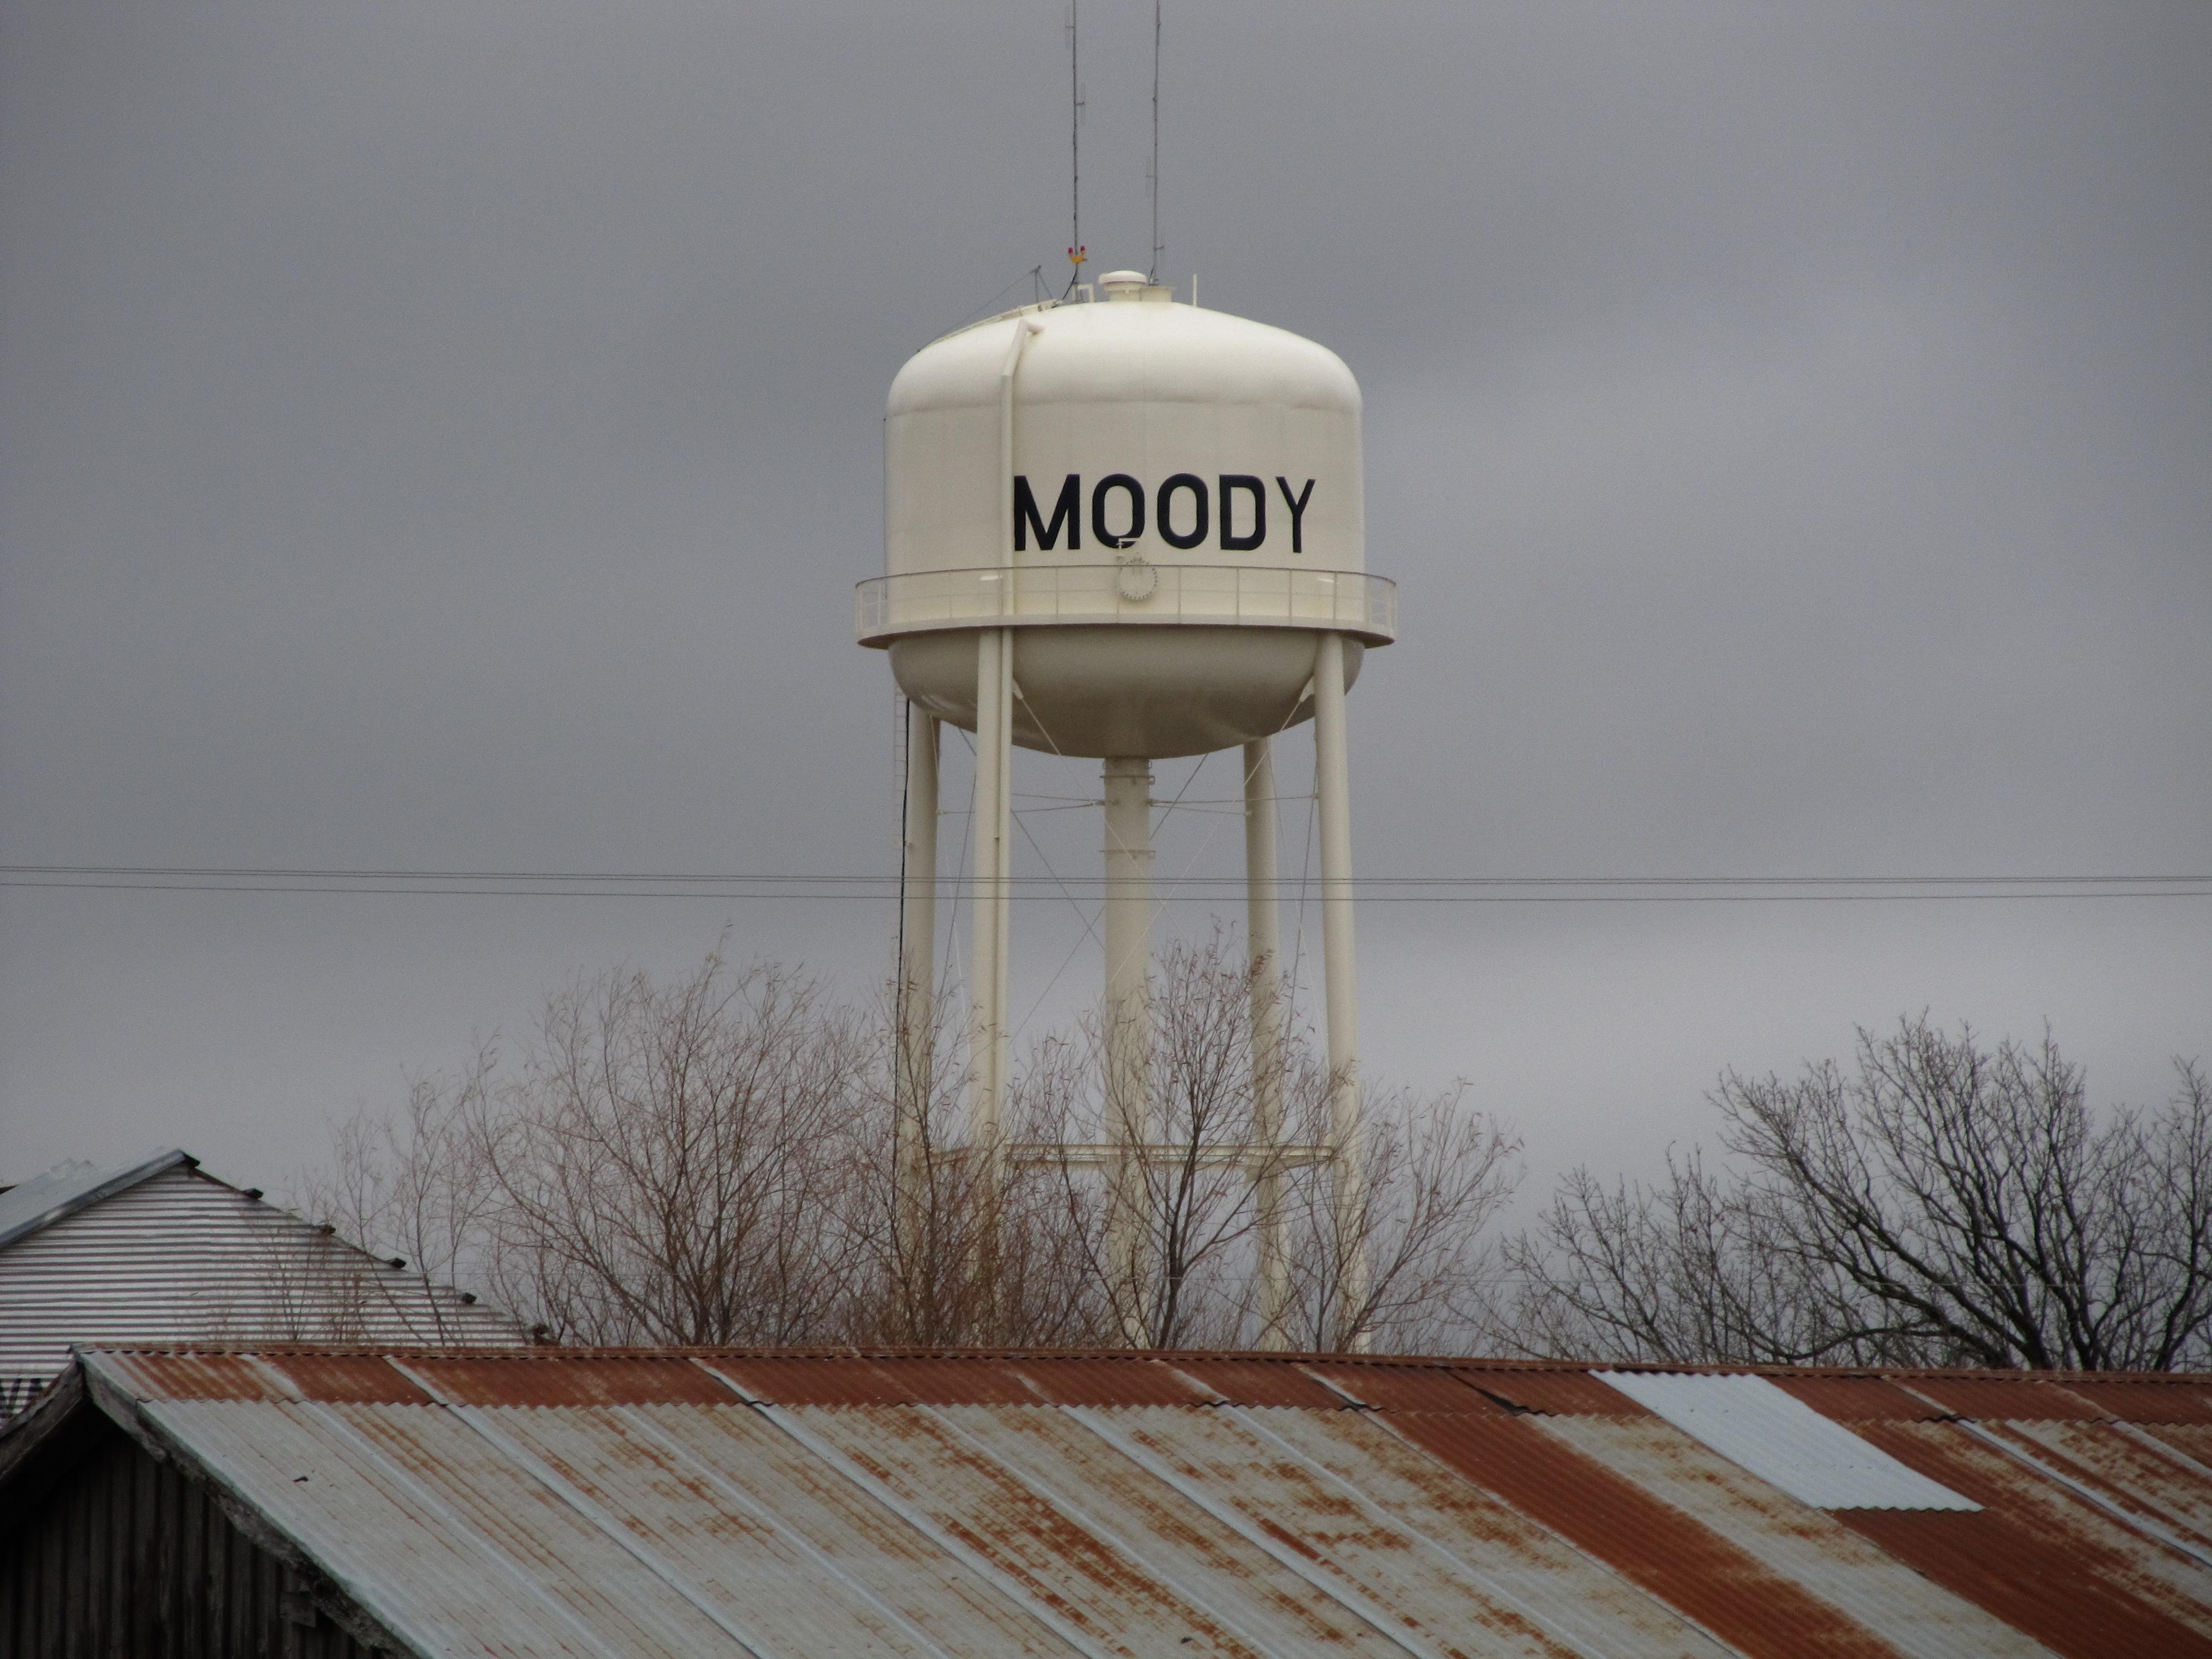 Home cash buyers in Moody TX